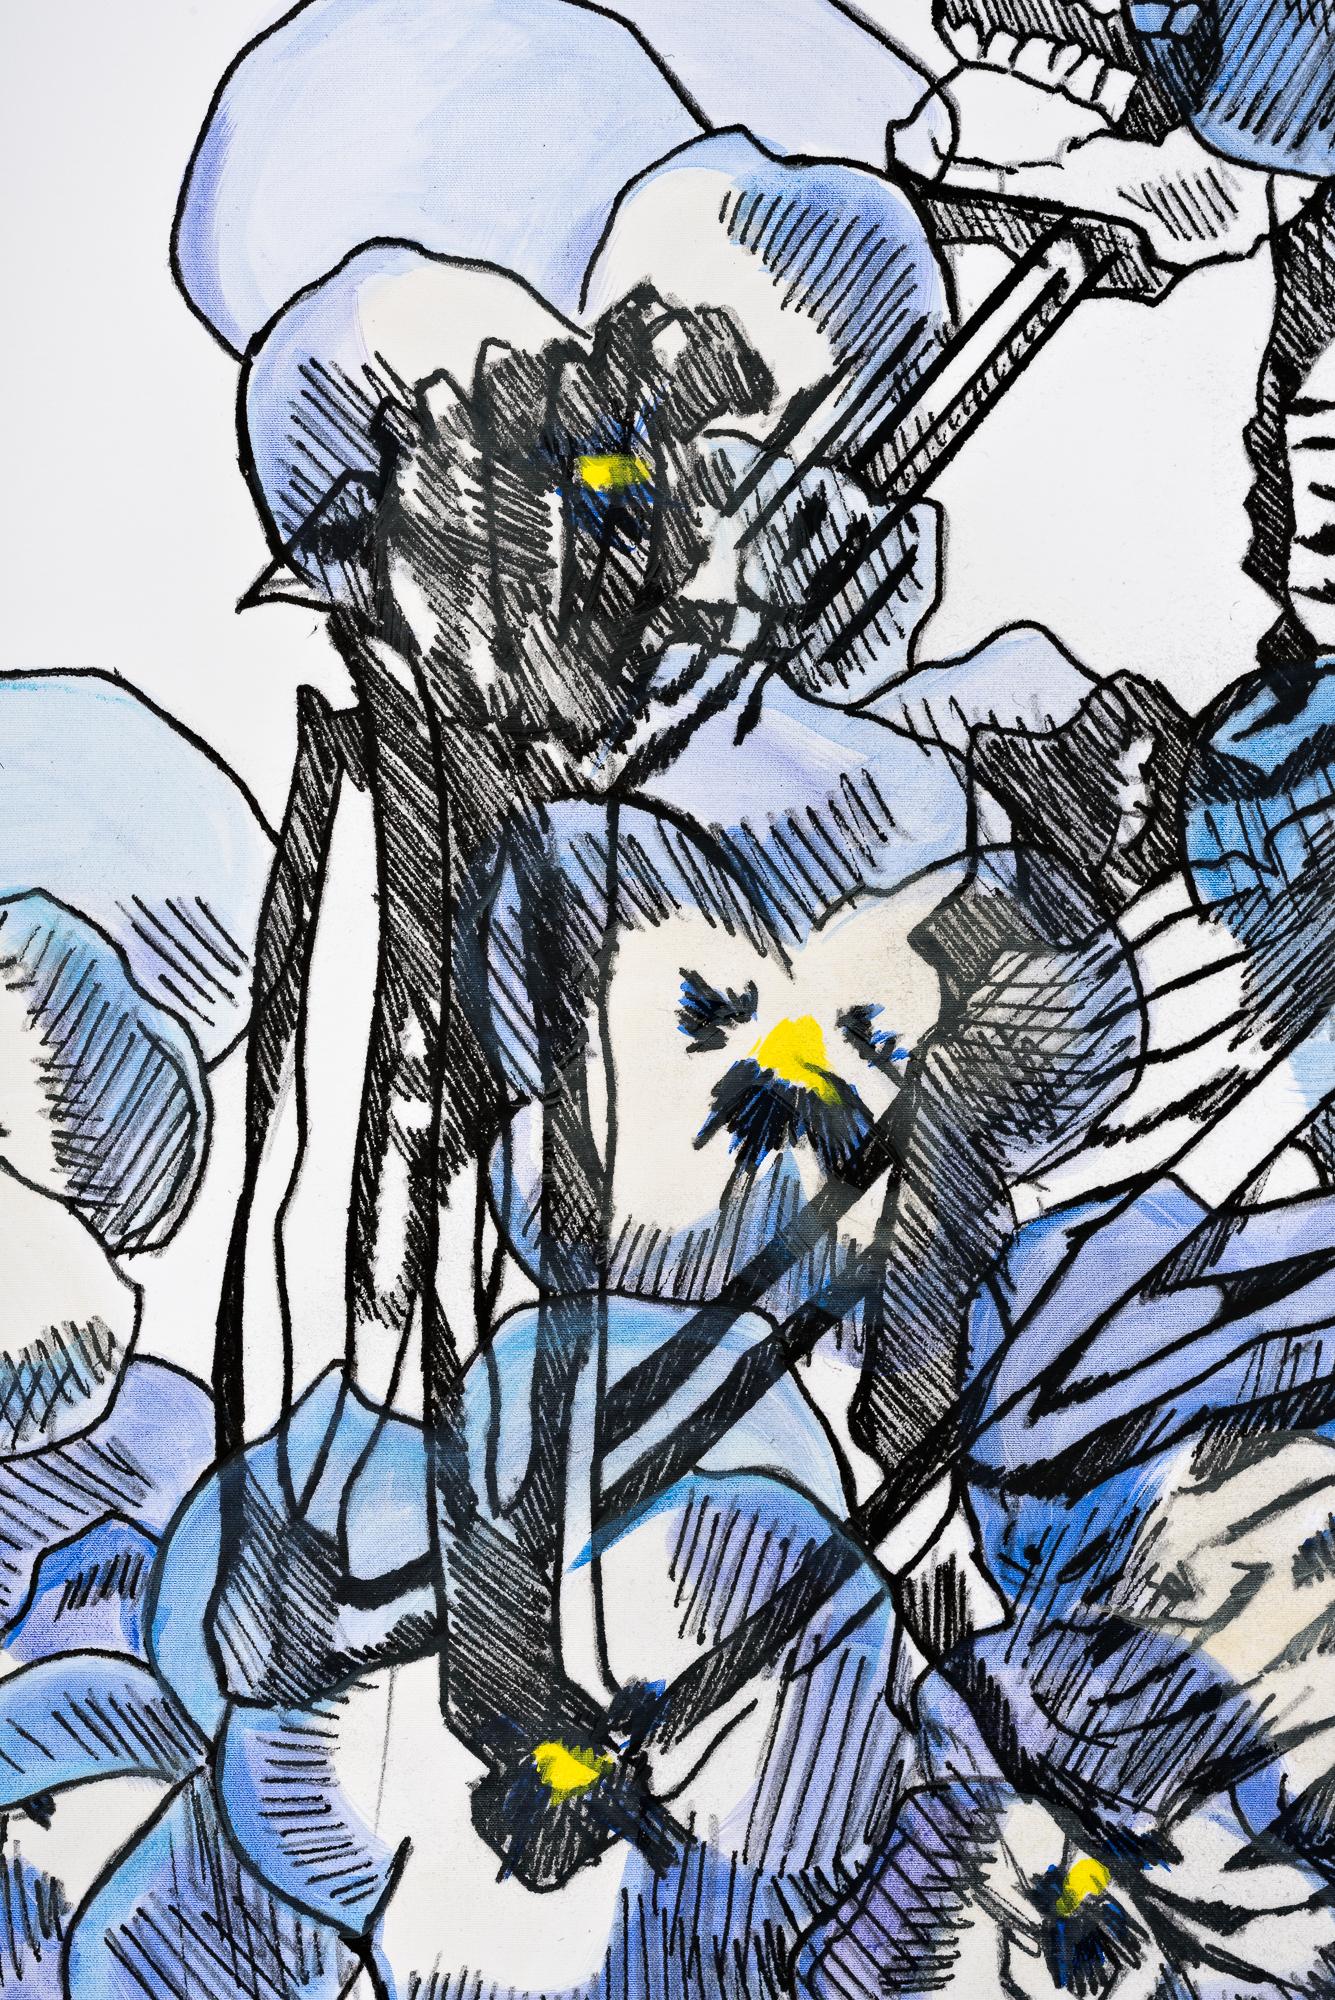 2019_03 - Mieke Marple-18.jpg